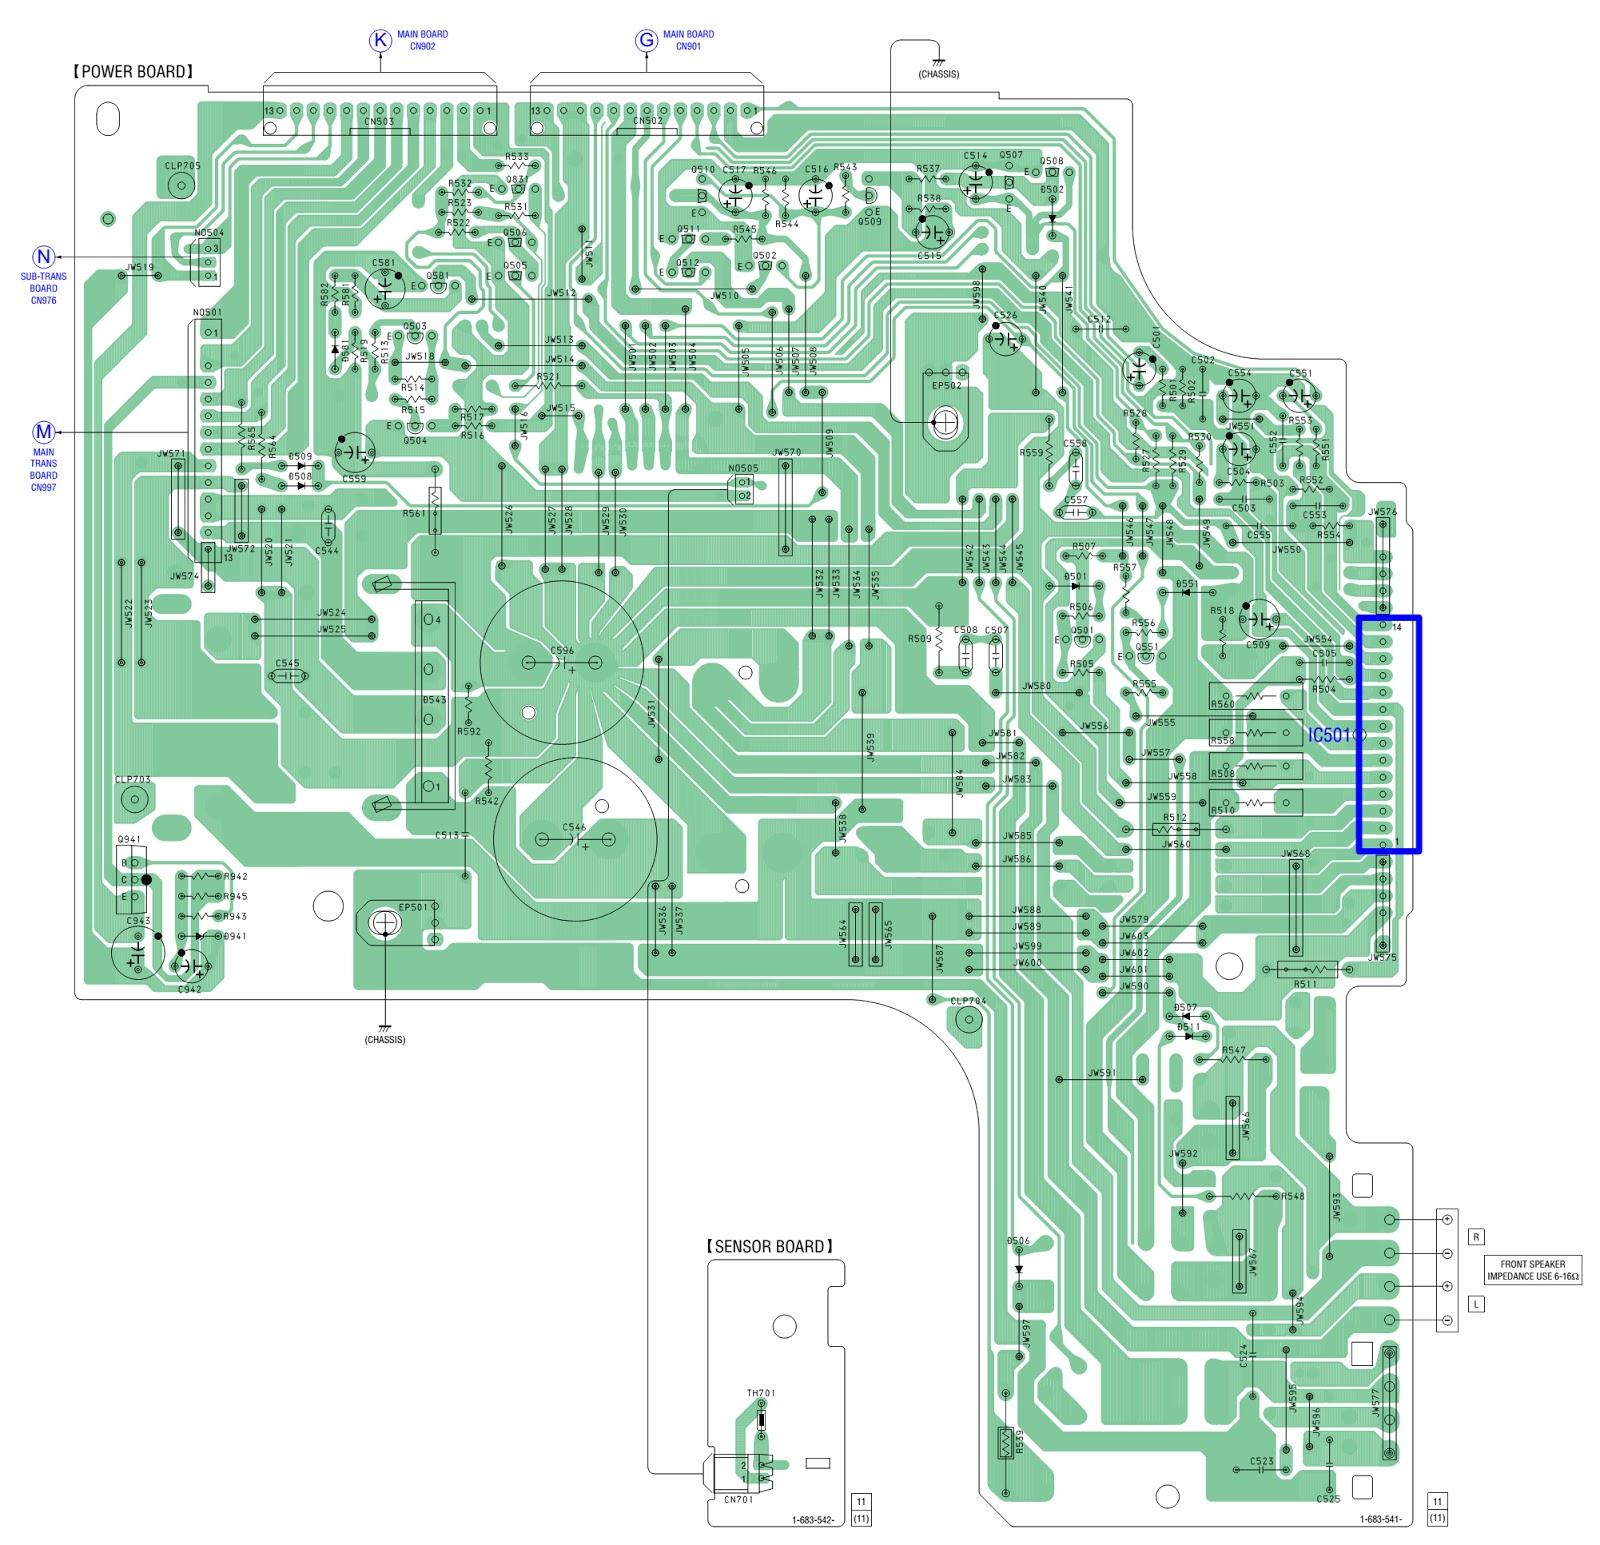 Sony Hcd Rg66t Stk 442 130 Power Amp Supply Schematics 2 X 40 Watt Amplifier Pwb